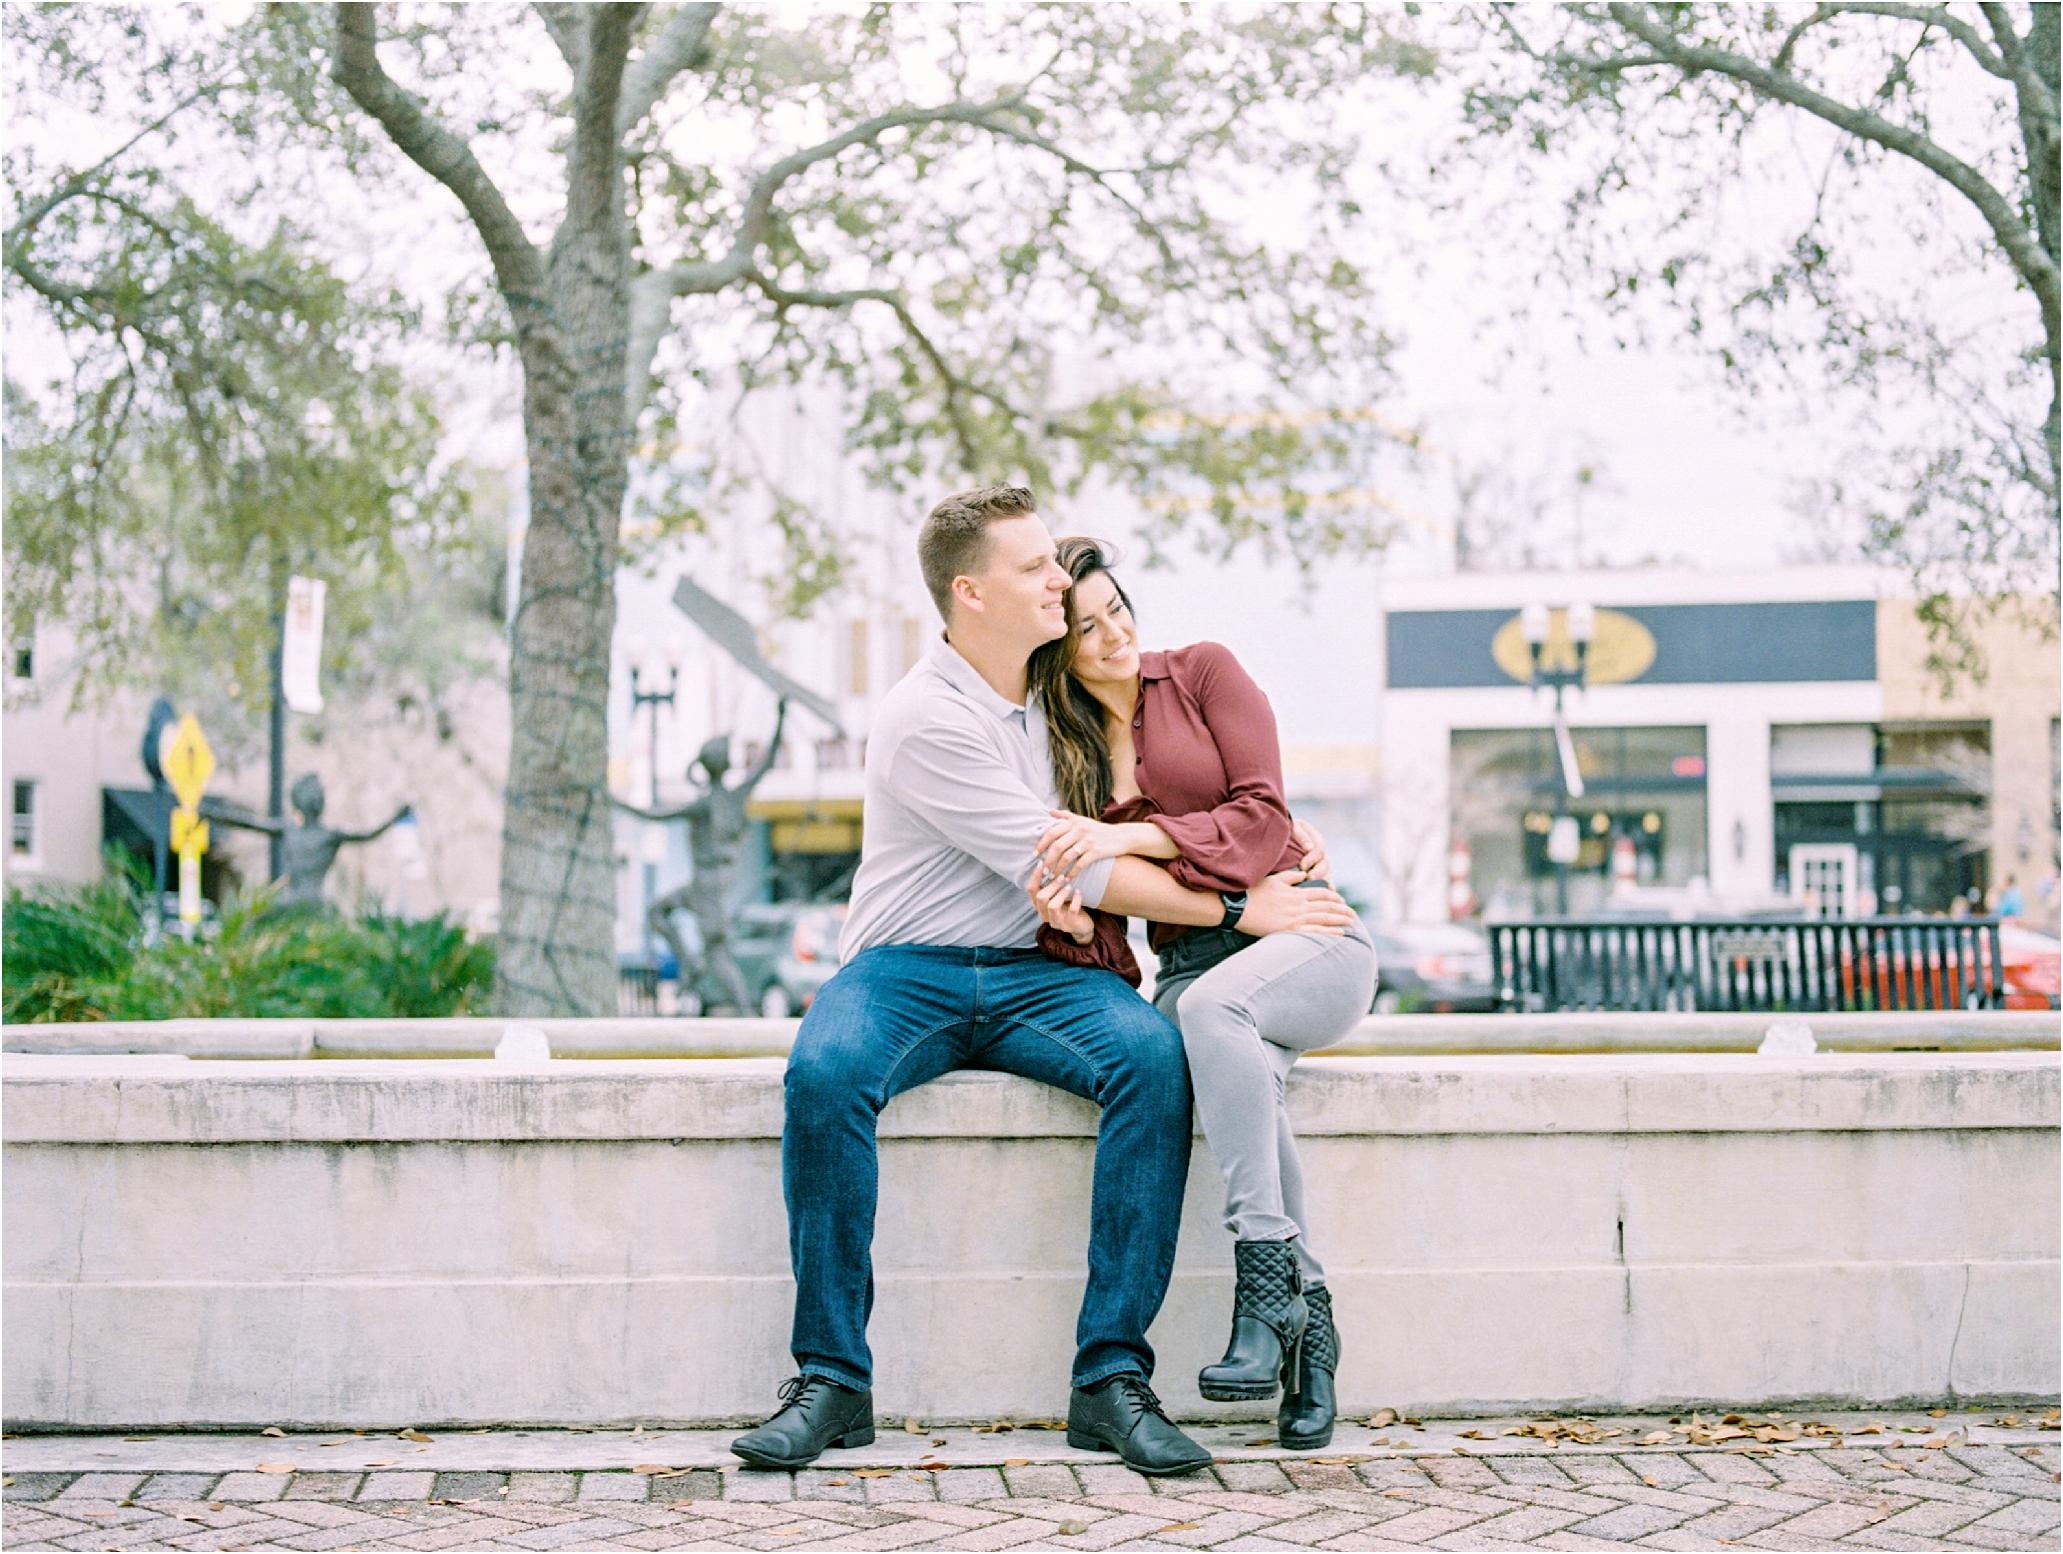 Lisa Silva Photography- Ponte Vedra Beach and Jacksonville, Florida Fine Art Film Wedding Photography- San Marco Jacksonville florida Engagement Session_0026.jpg